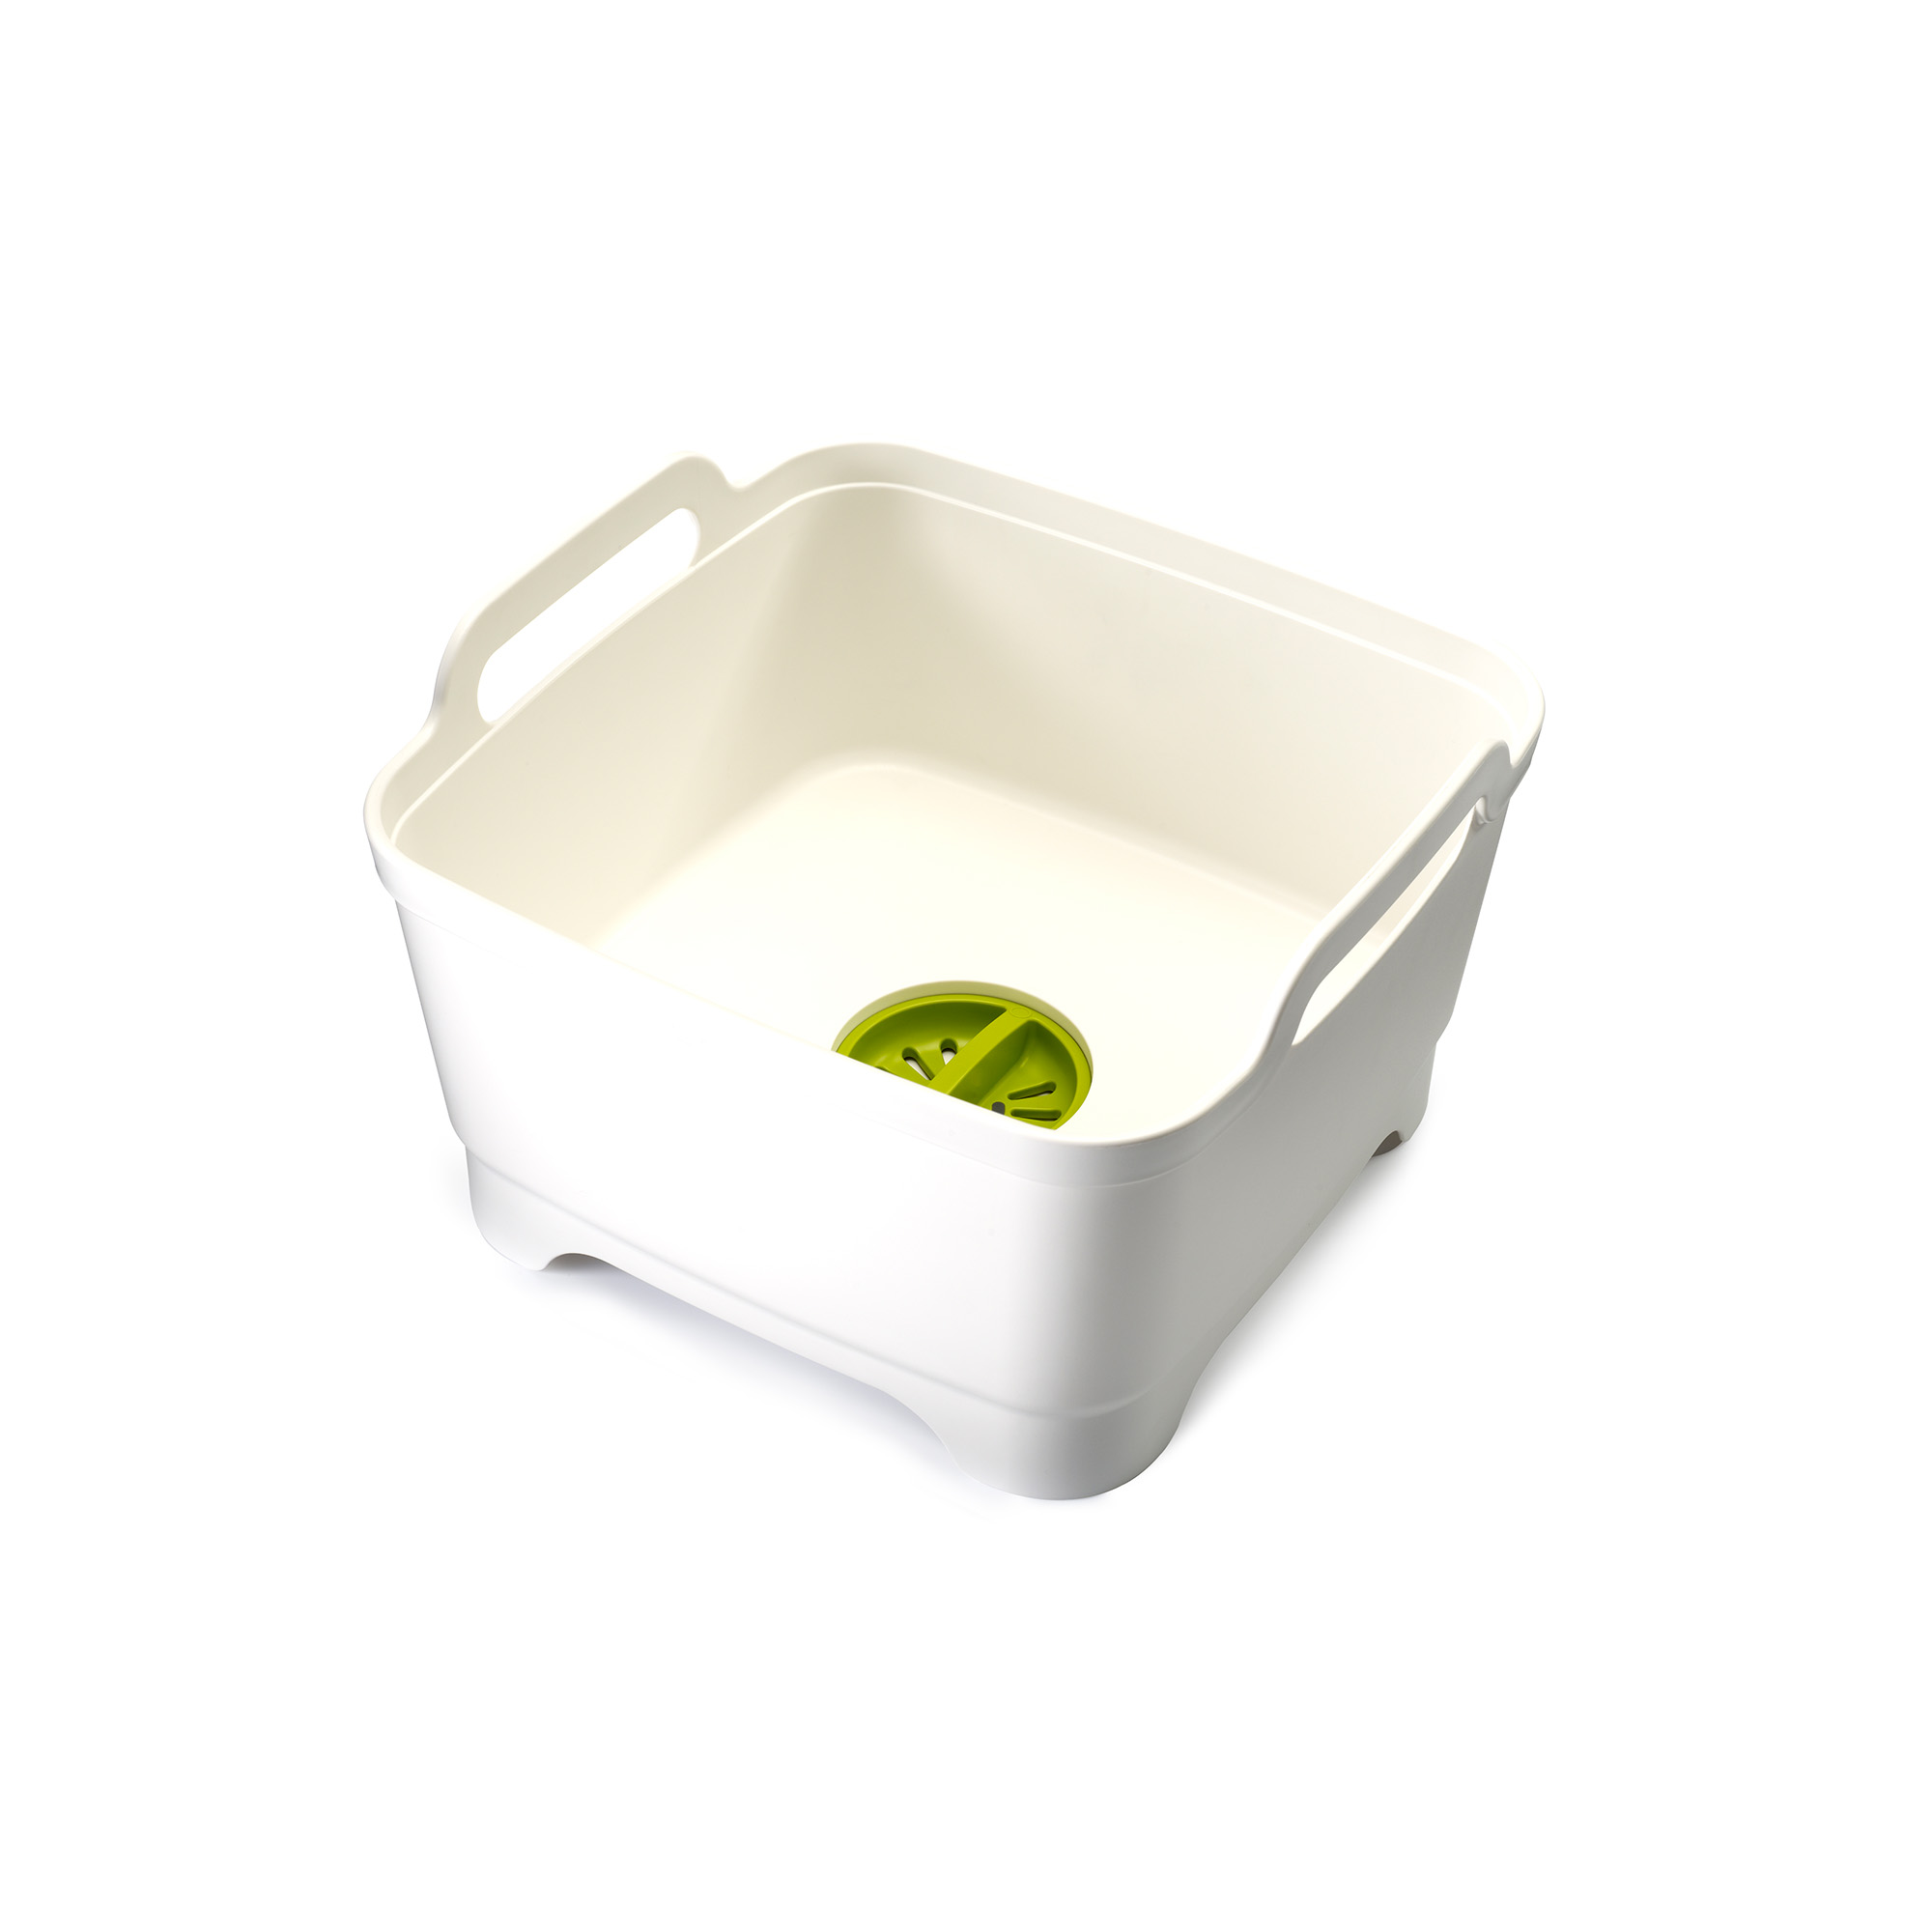 Wash & Drain Washing Up Bowl Wht/Grn